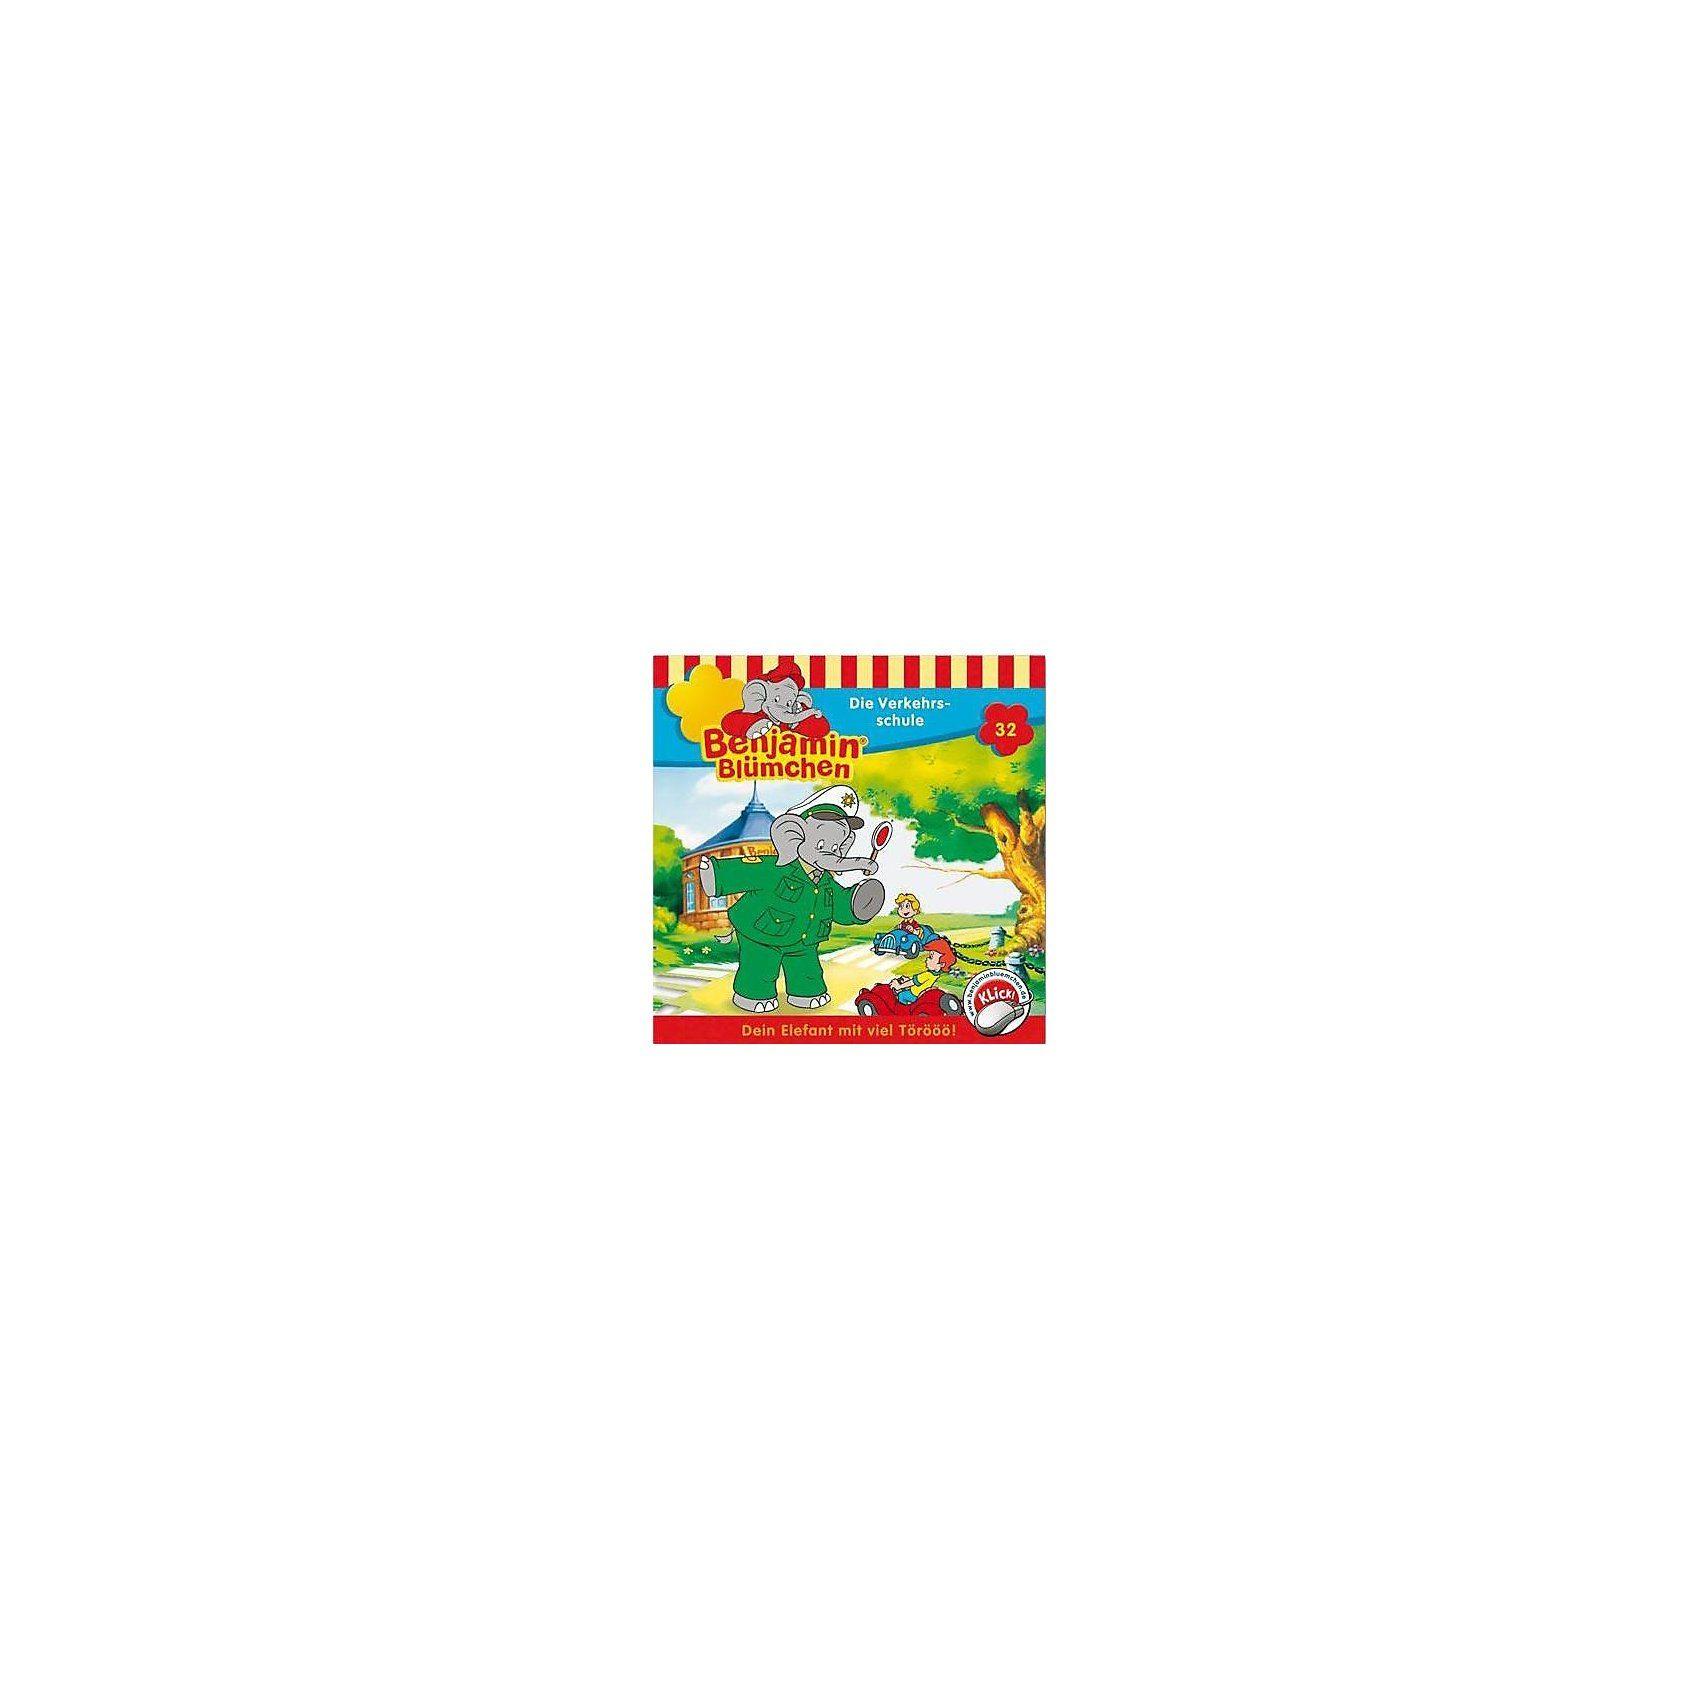 Kiddinx CD Benjamin Blümchen 32 - Die Verkehrsschule